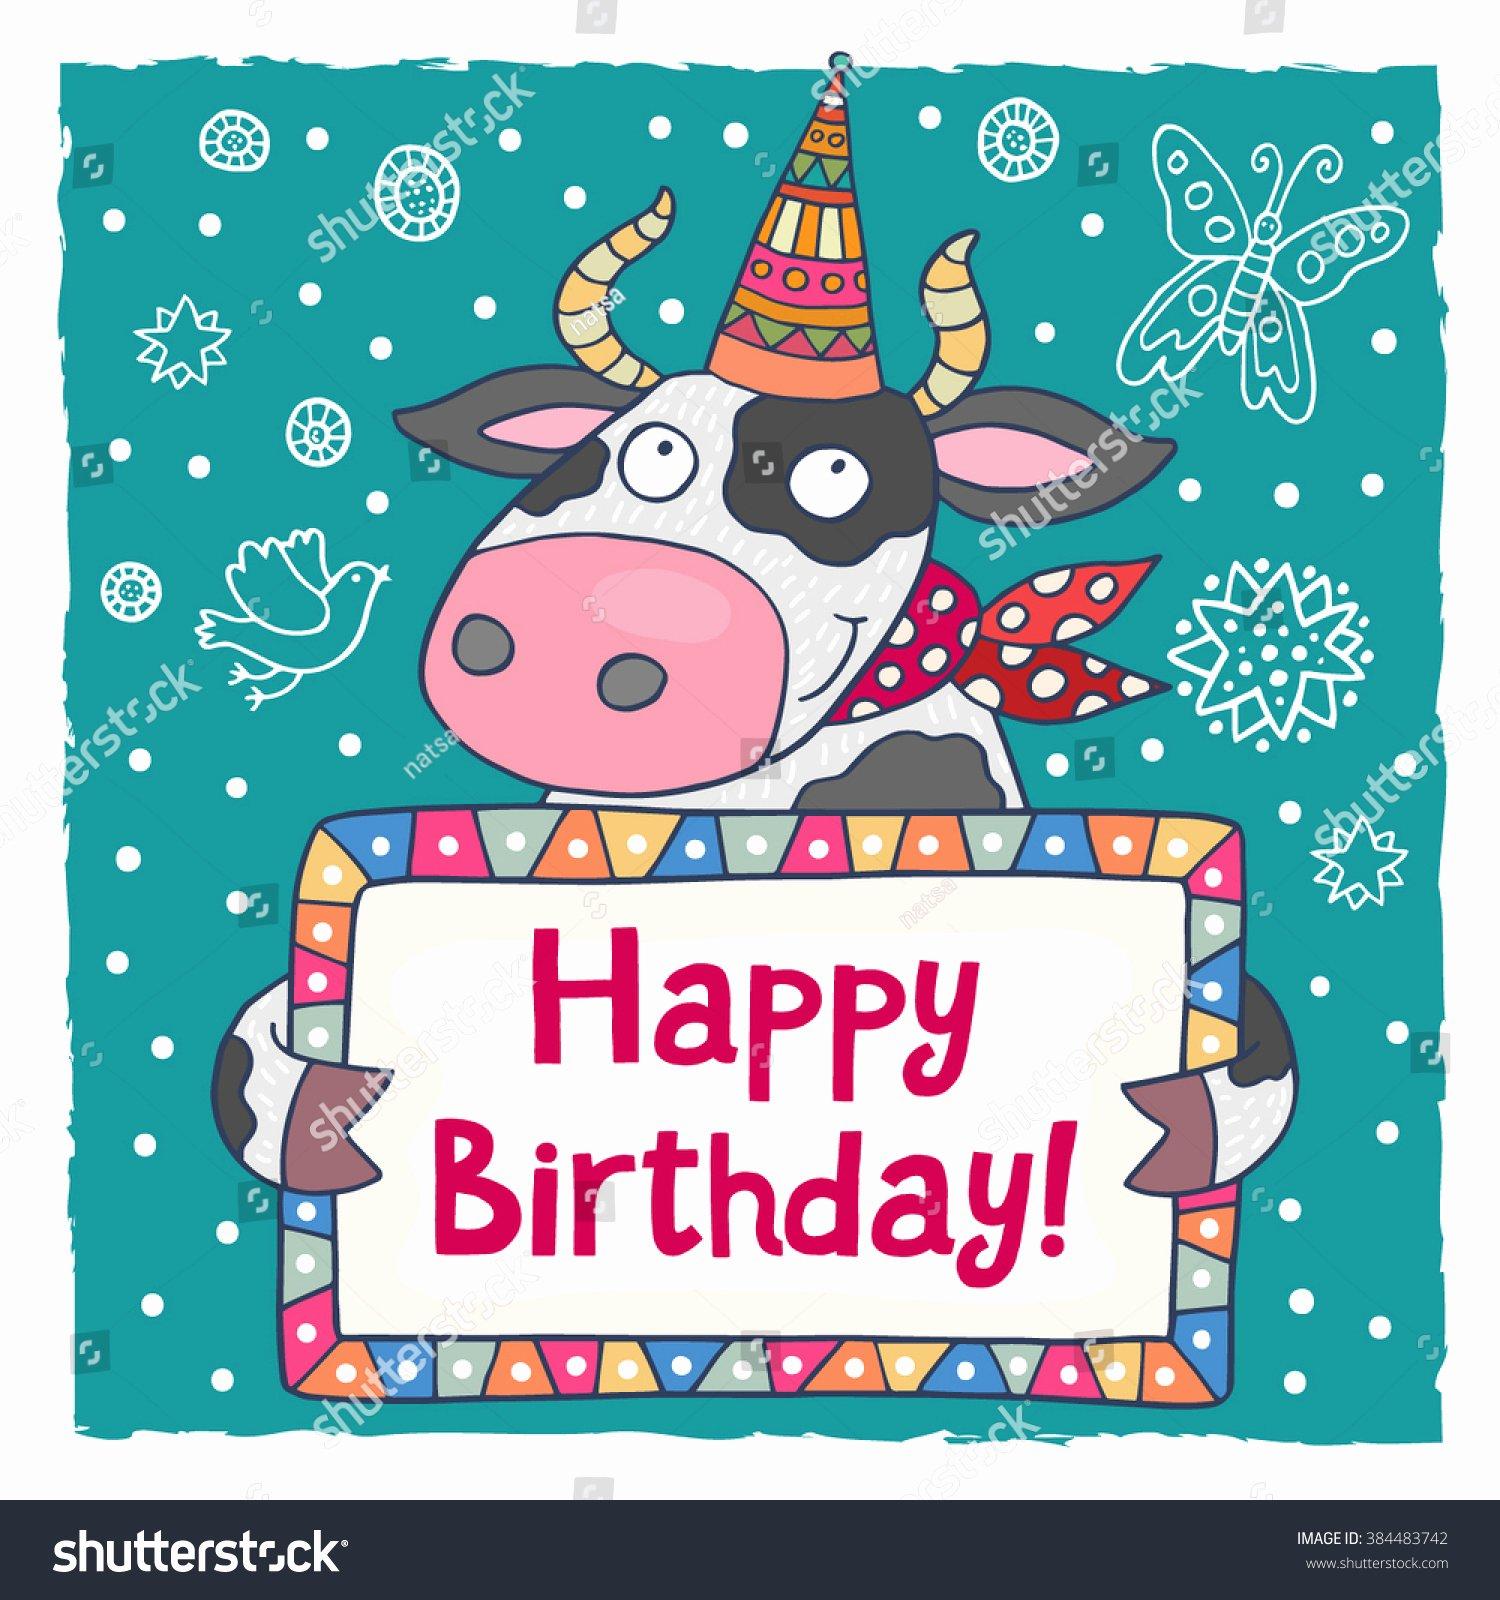 Happy Birthday Template Word Fresh Happy Birthday Word Template Portablegasgrillweber